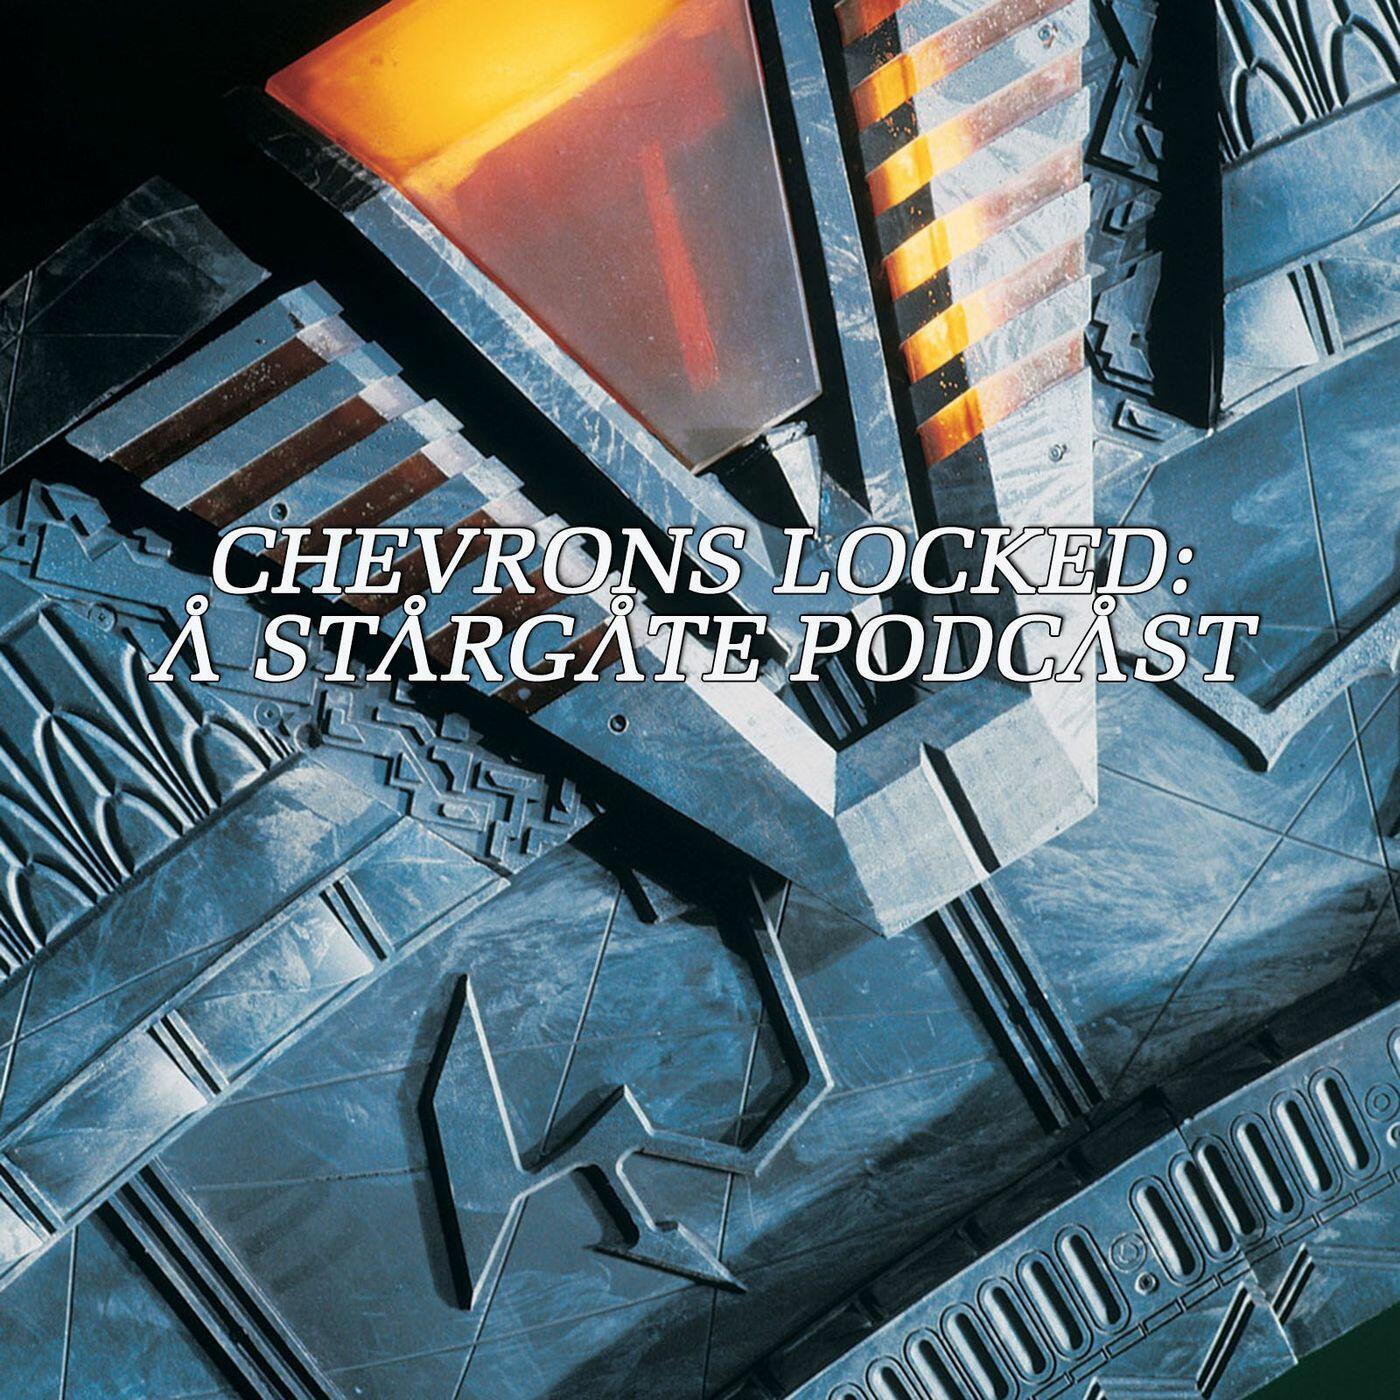 Chevrons Locked: A Stargate Podcast